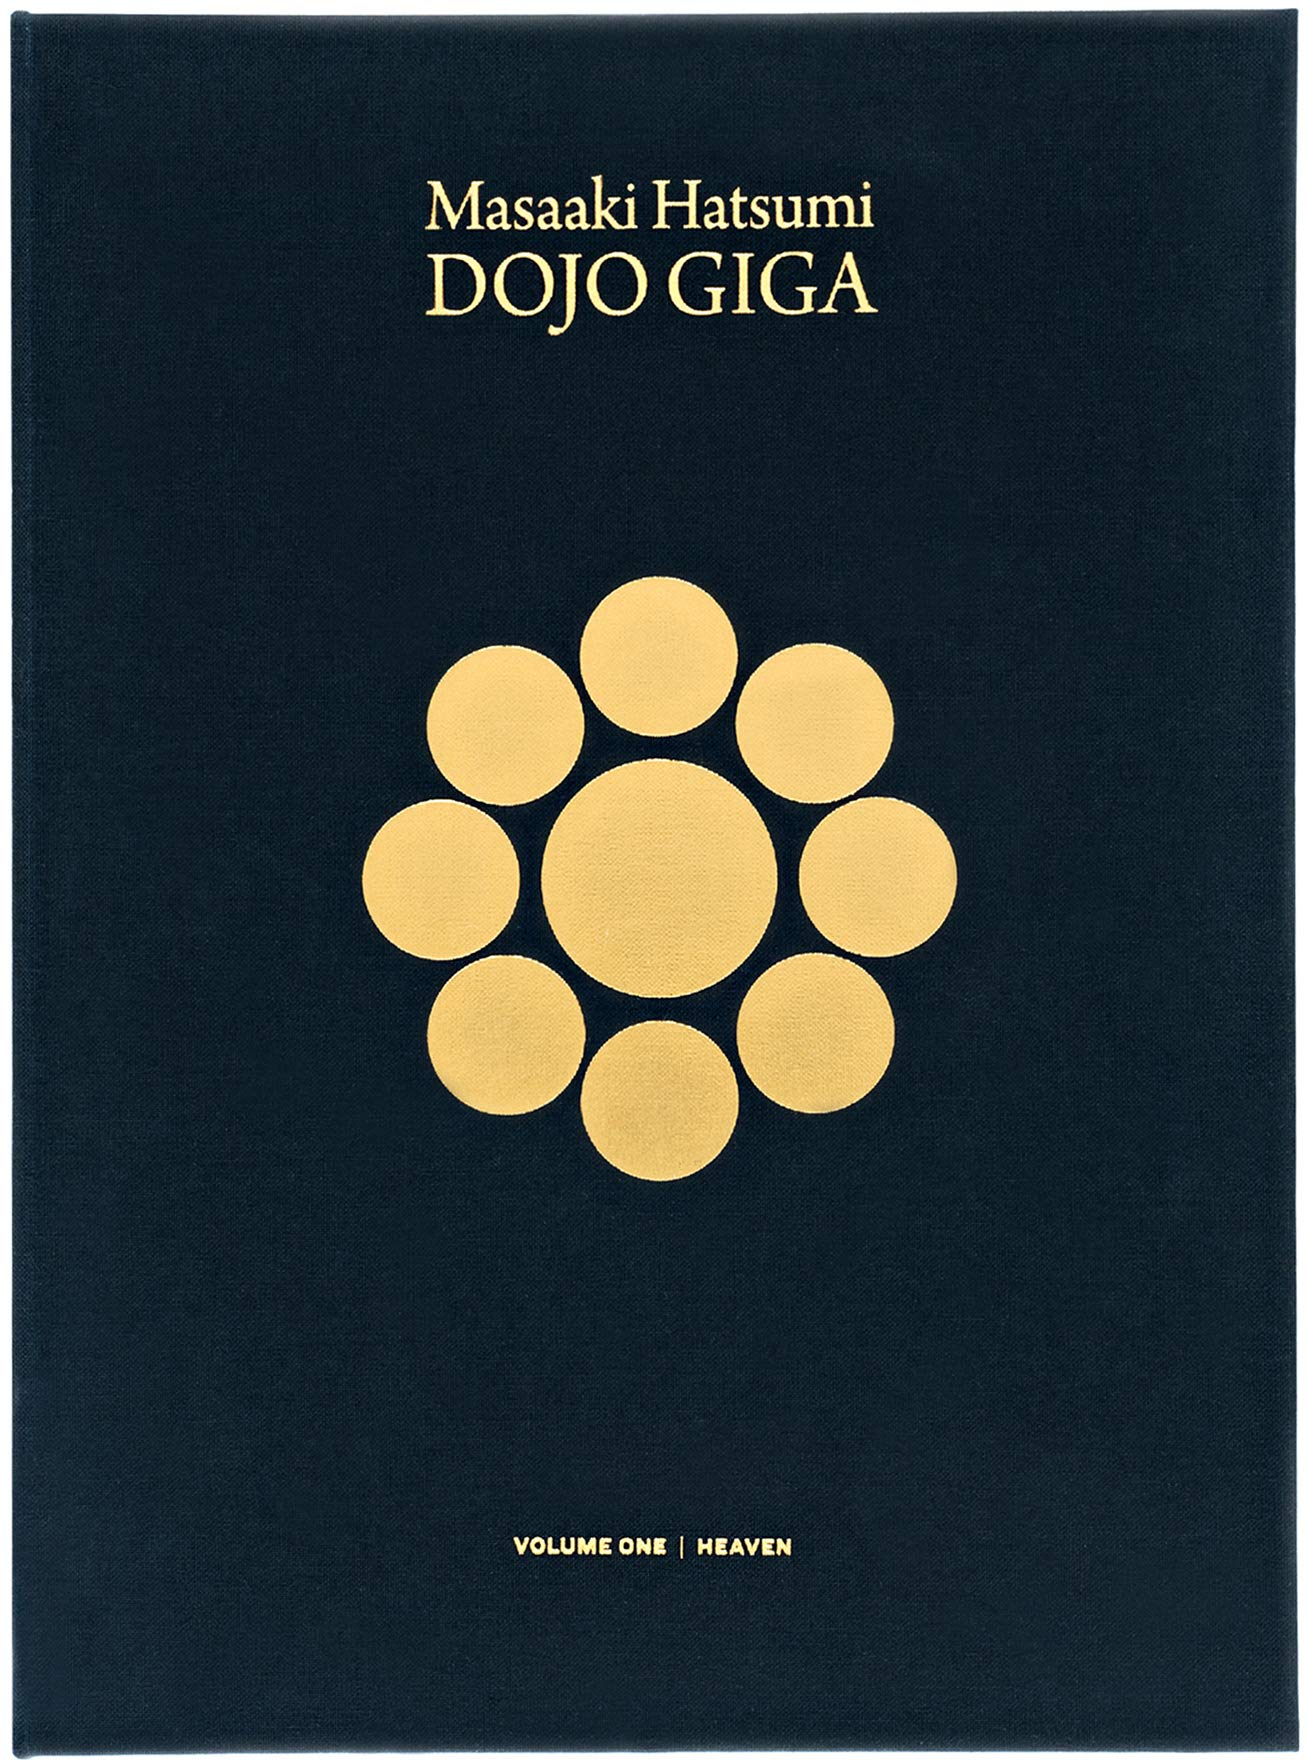 Masaaki Hatsumi: Dōjō Giga | Heaven: Masaaki Hatsumi ...